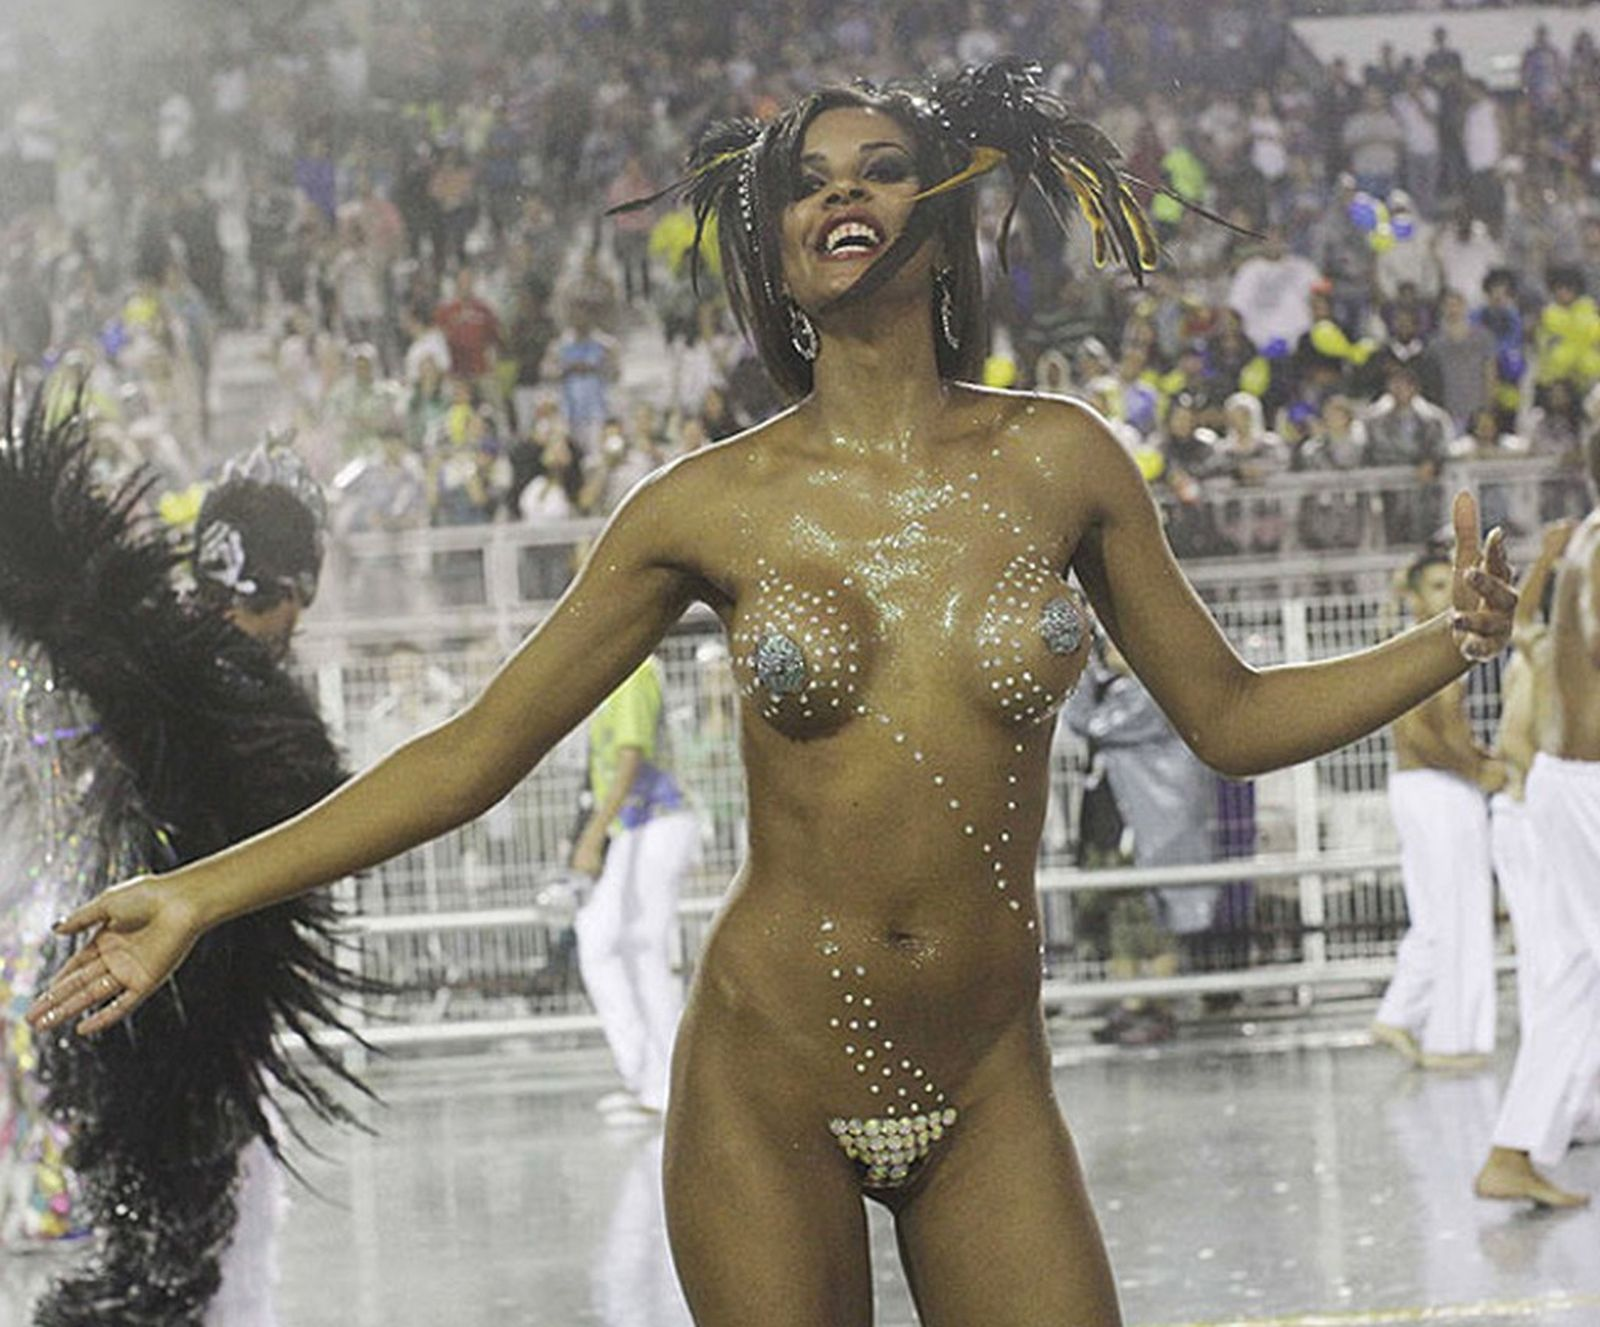 Big Boobs Brazilian Topless Dancer Carnival Nude Milf Beach Hi Def Pic